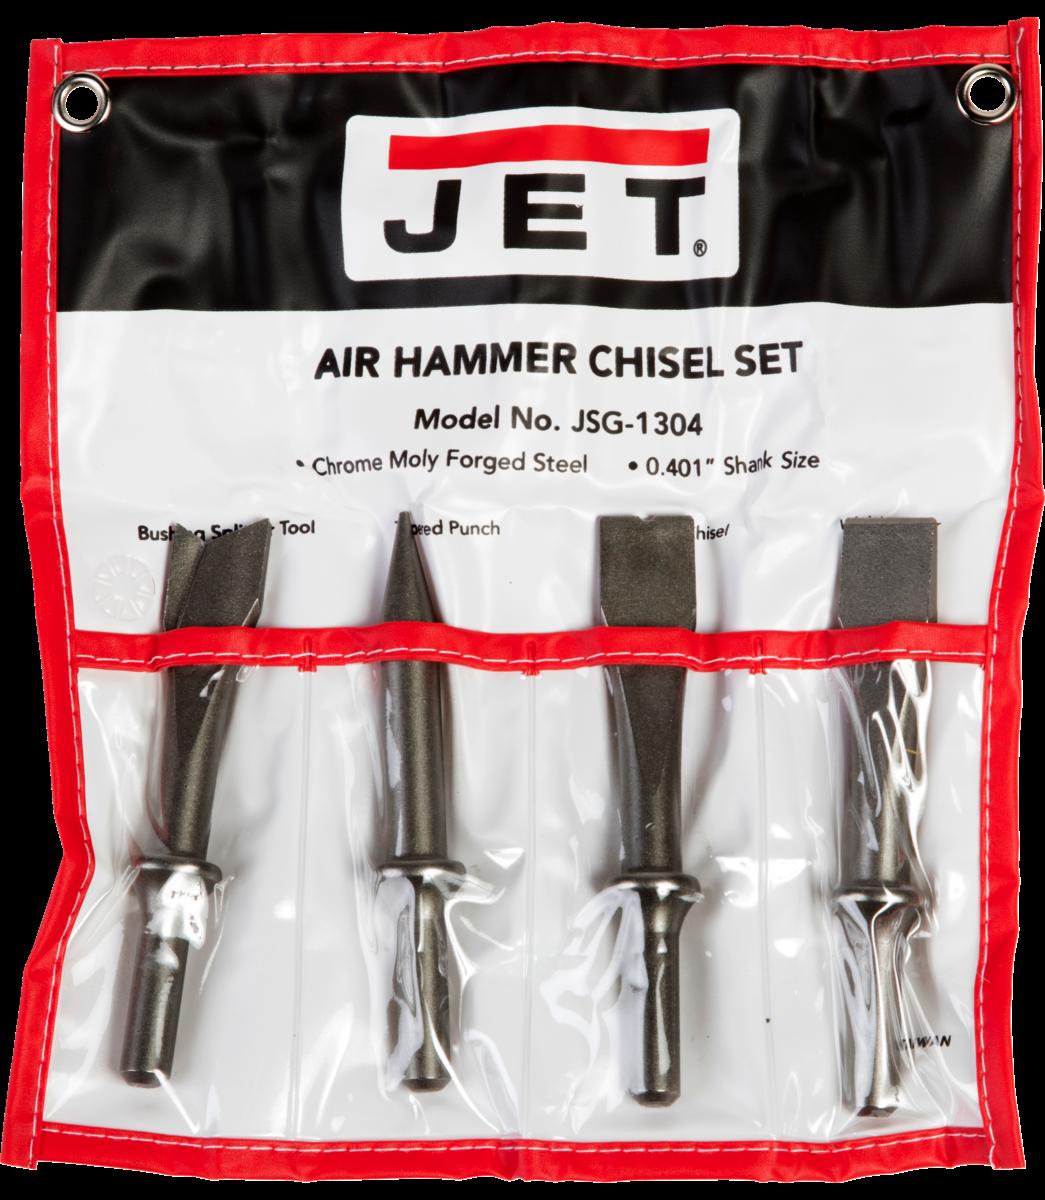 JSG-1304, juego de escoplo de 4 piezas para atornilladores neumáticos